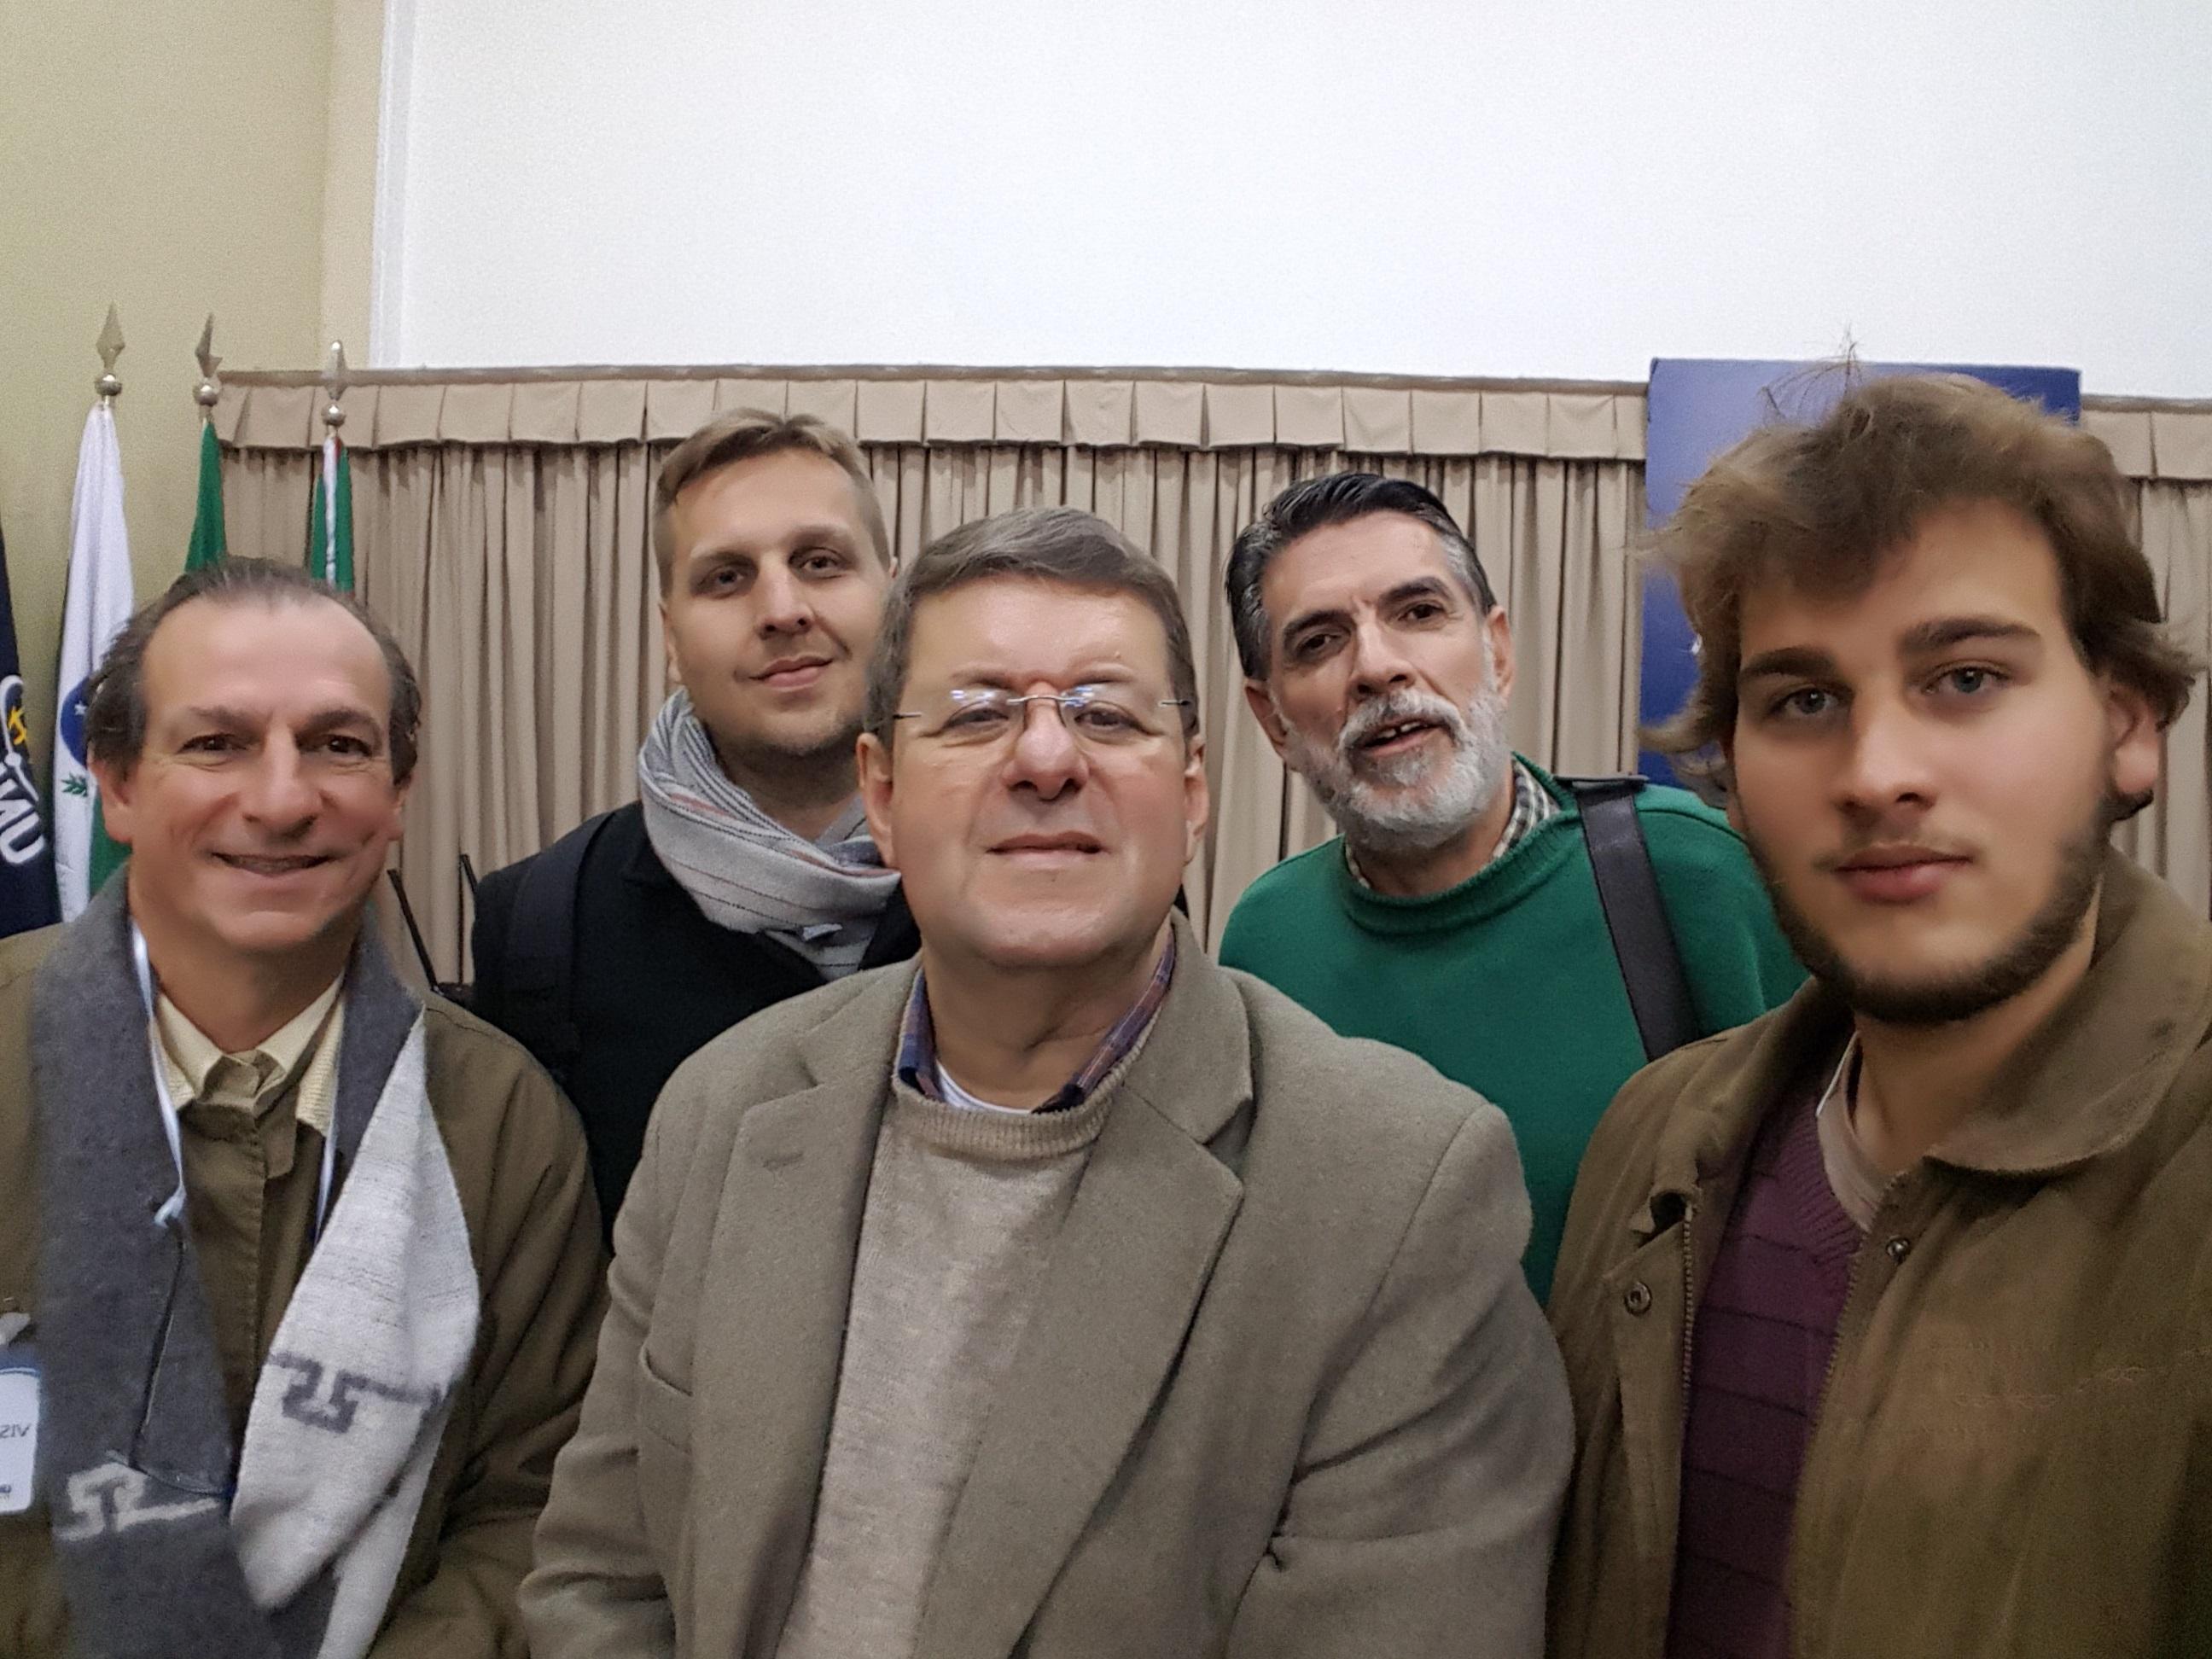 Paulo Mosimann, Luiz Gustavo Schmoekel, Jorge Cury Neto, Valdir Cruz e Klaus Mosimann